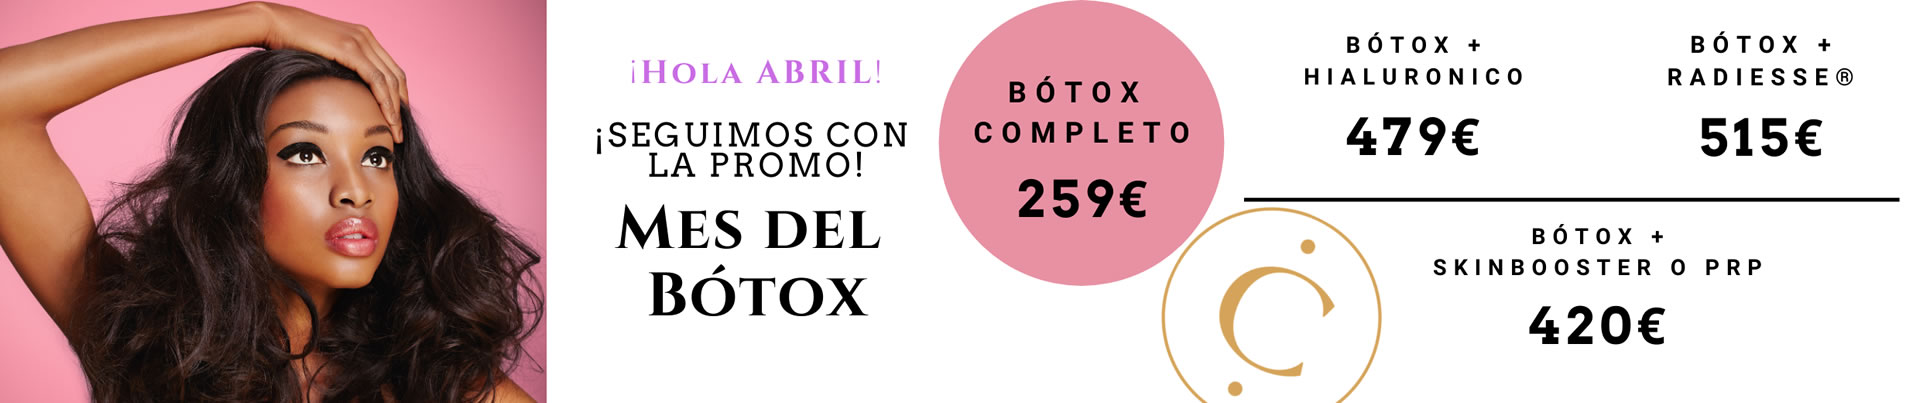 LaClinic - Abril - Botox